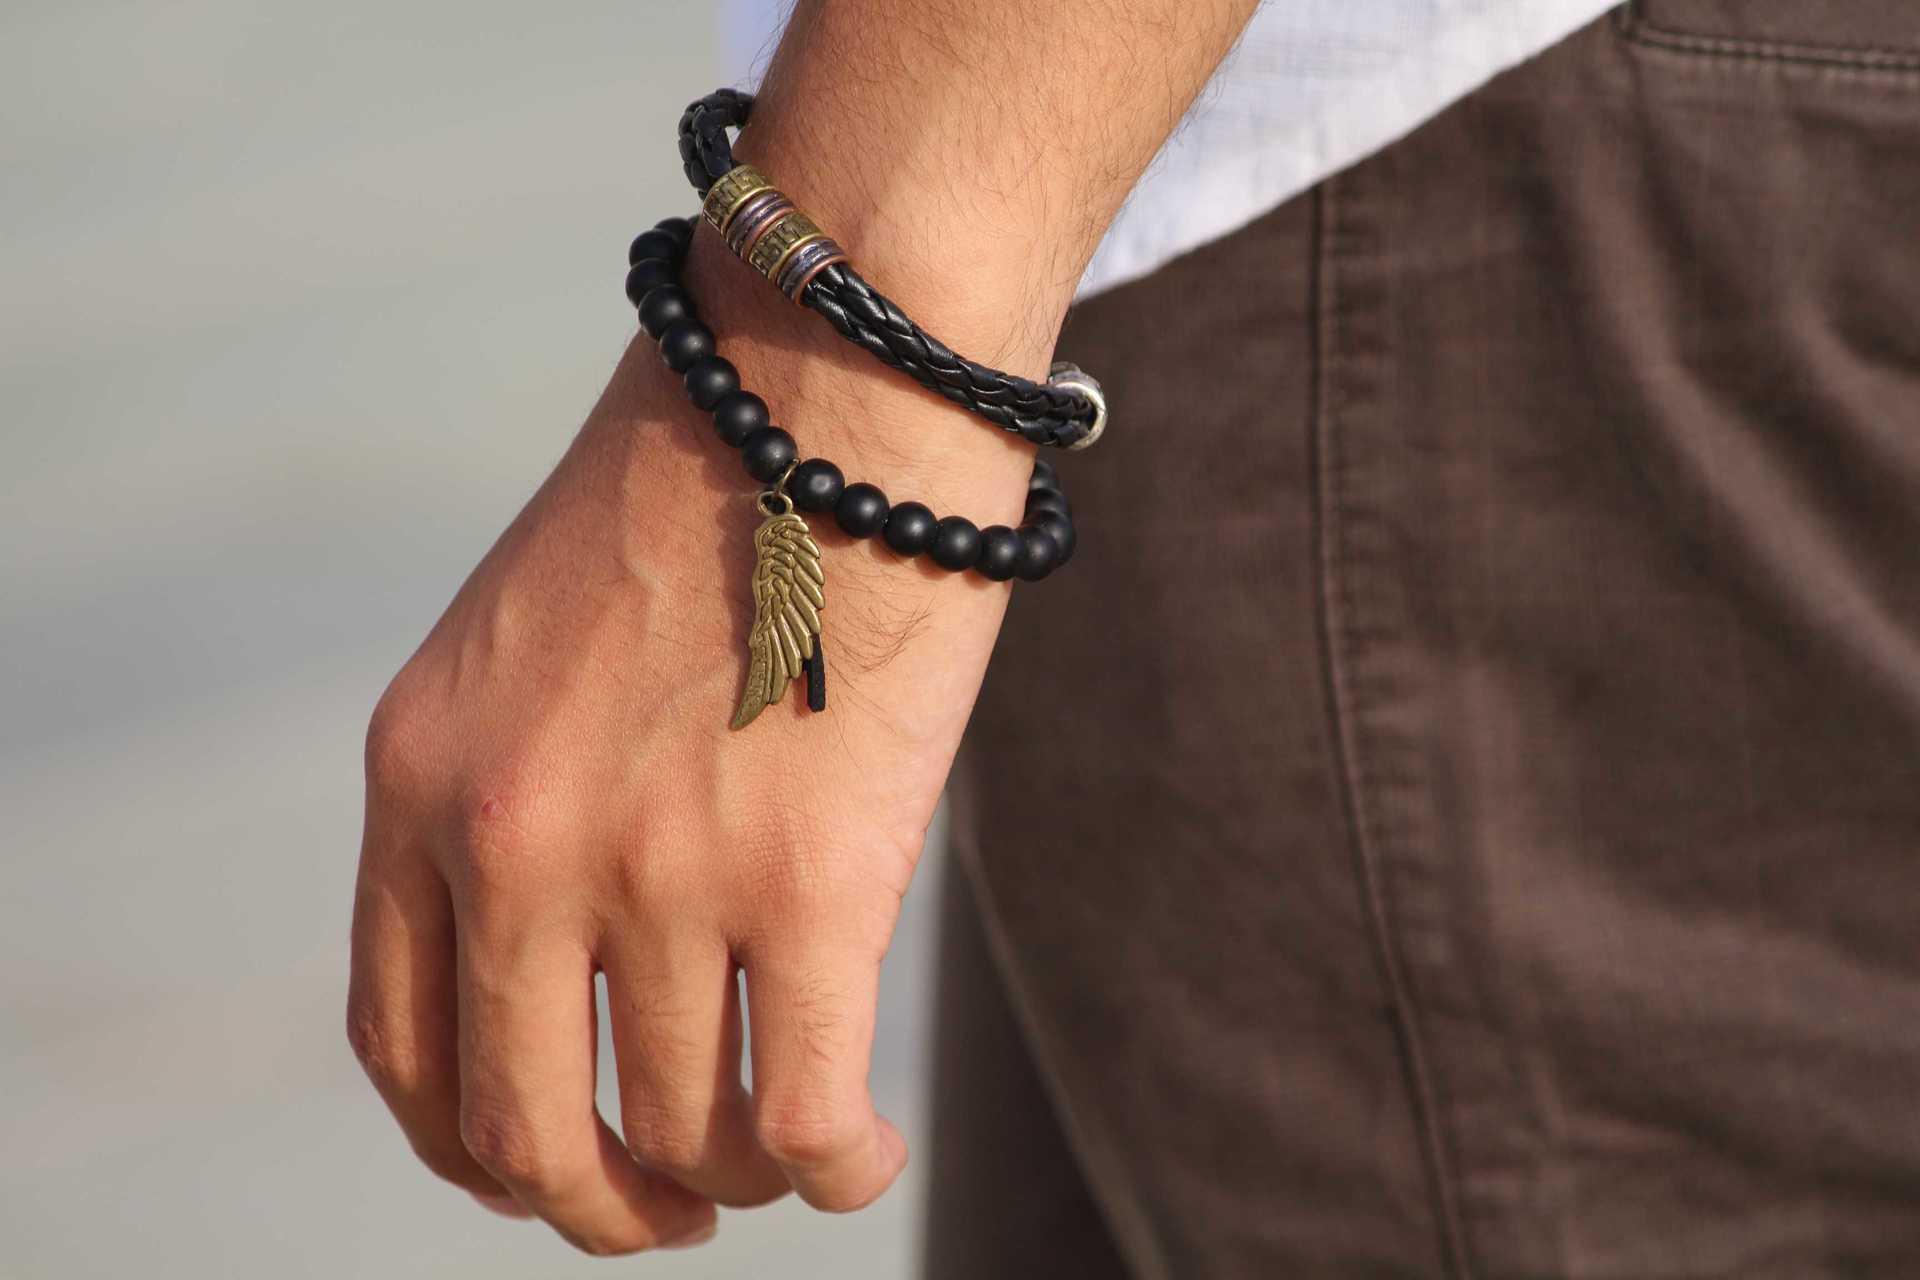 Bracelet by Dare Voylla image